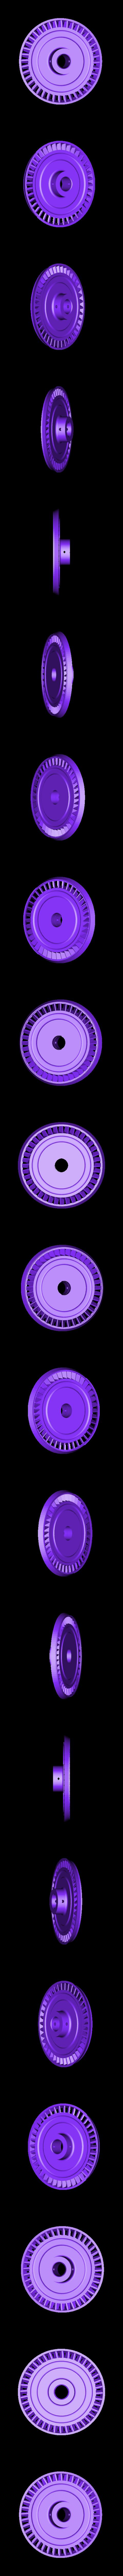 IPT-Rotor101.stl Download free STL file Jet Engine, 3-Spool • 3D printable object, konchan77